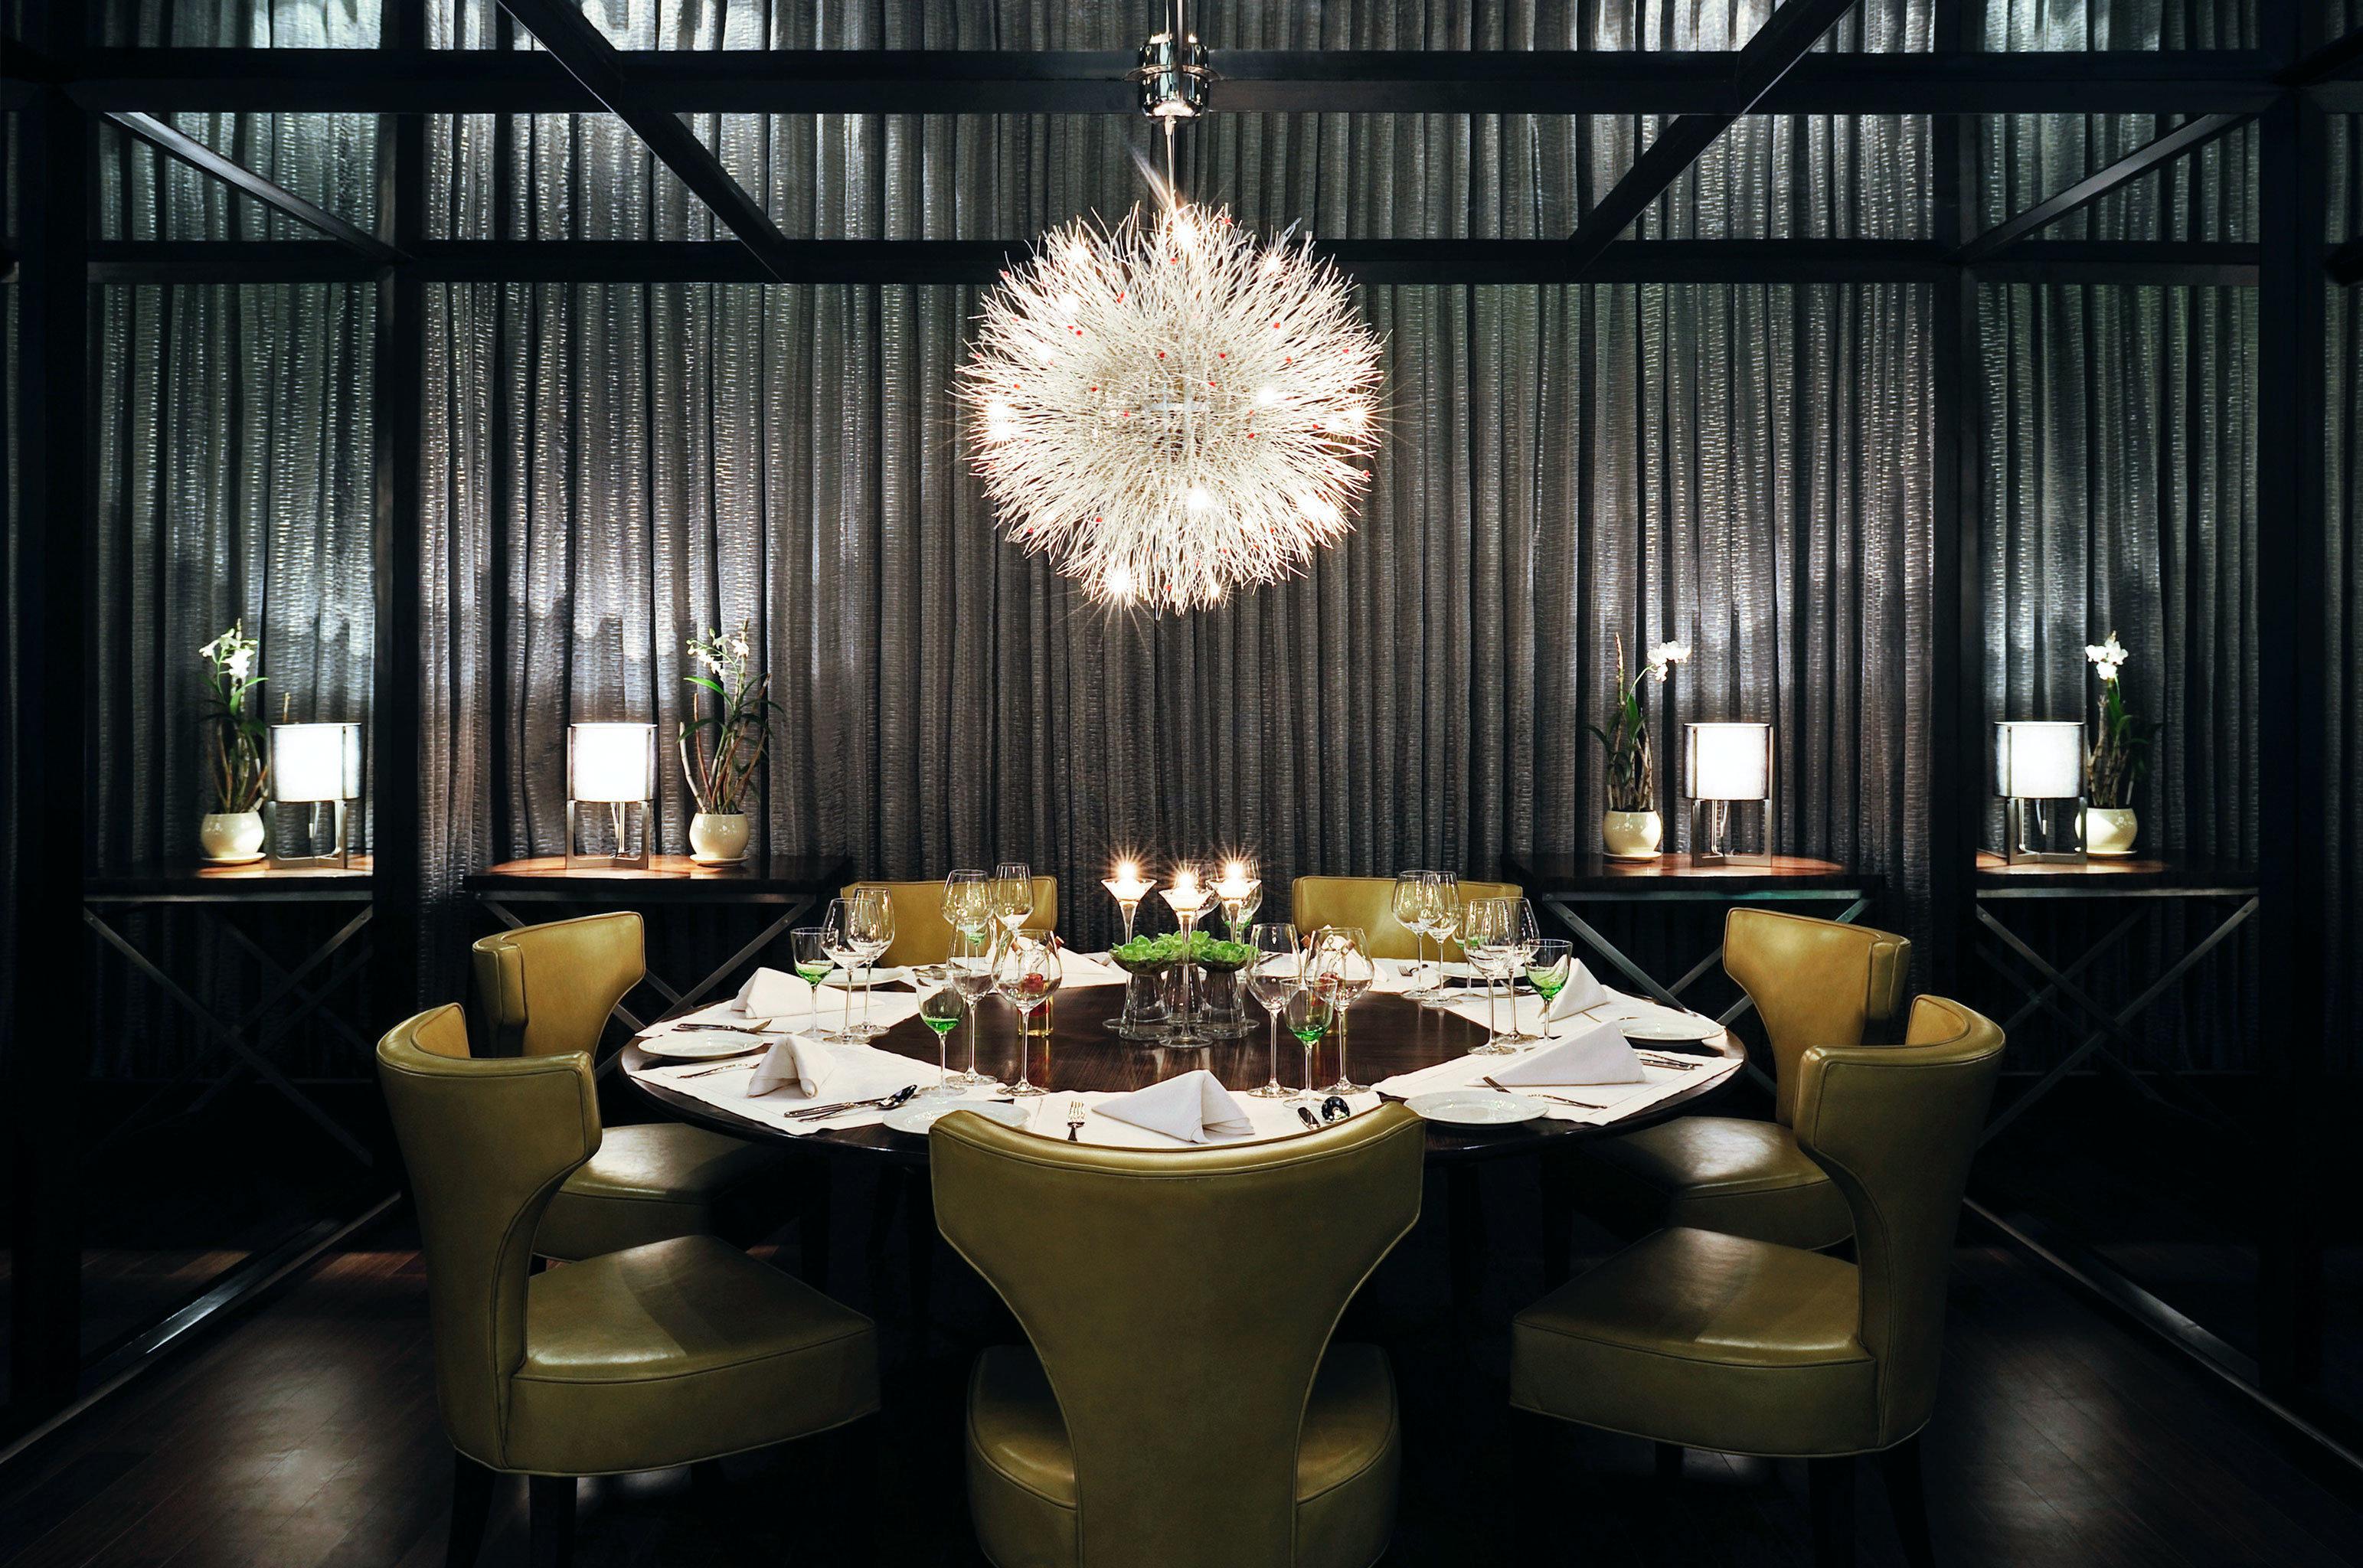 Dining Drink Eat Luxury restaurant lighting function hall living room